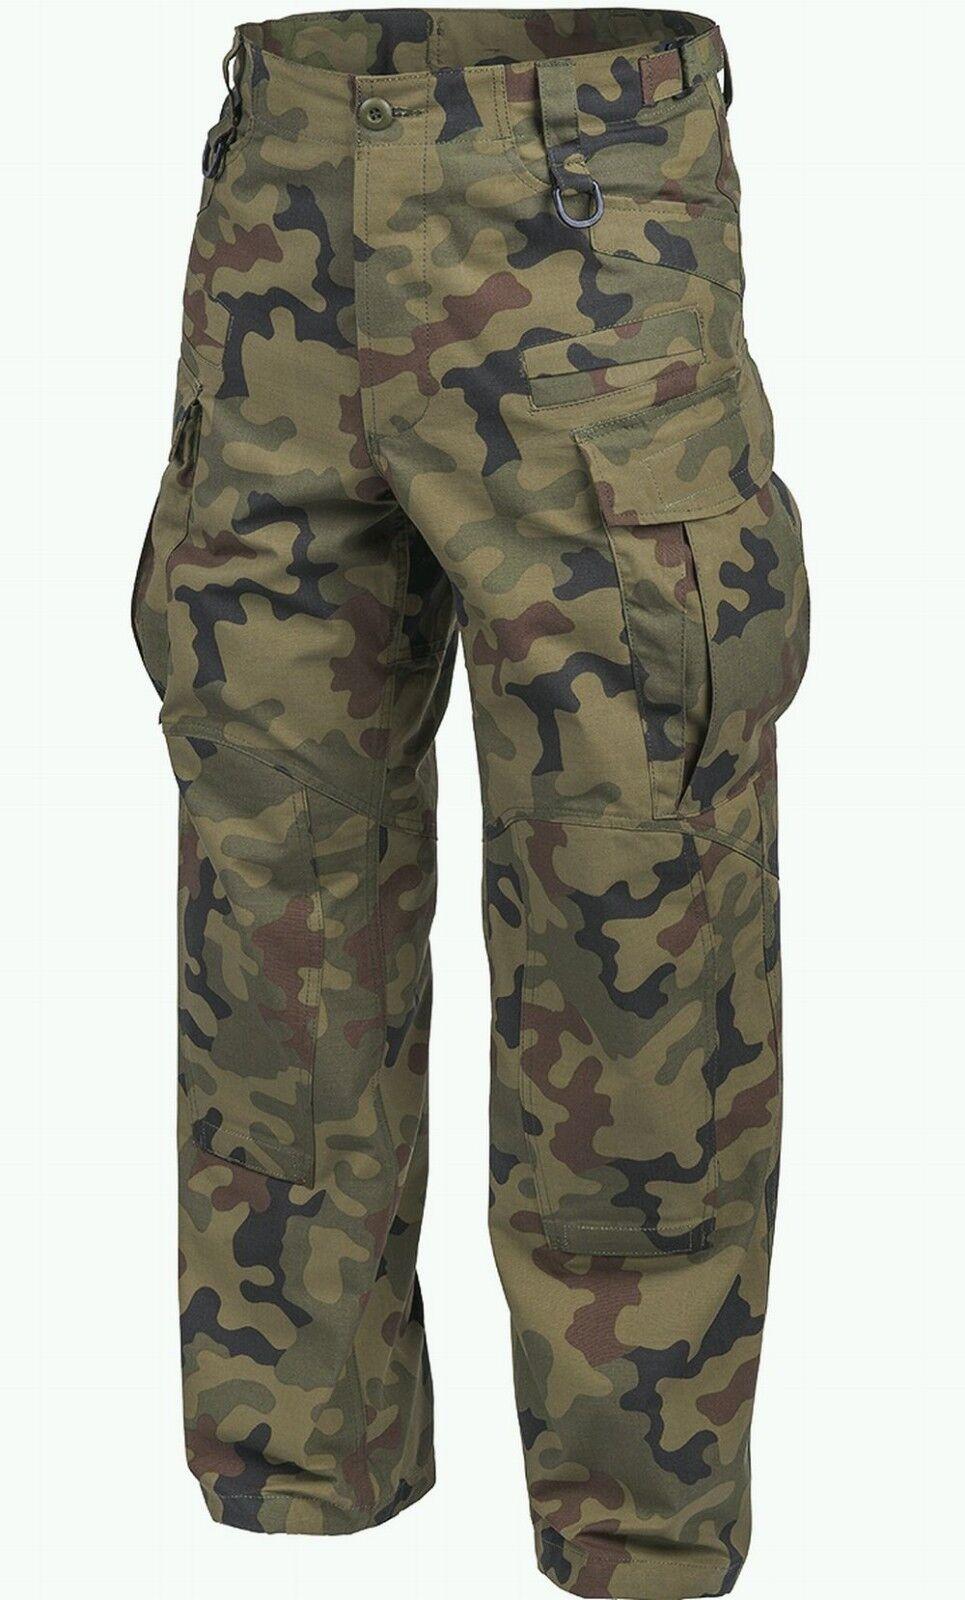 Helikon SFU NEXT Army Combat Trousers Cadet Tactical Pants US Woodland Camo XL R